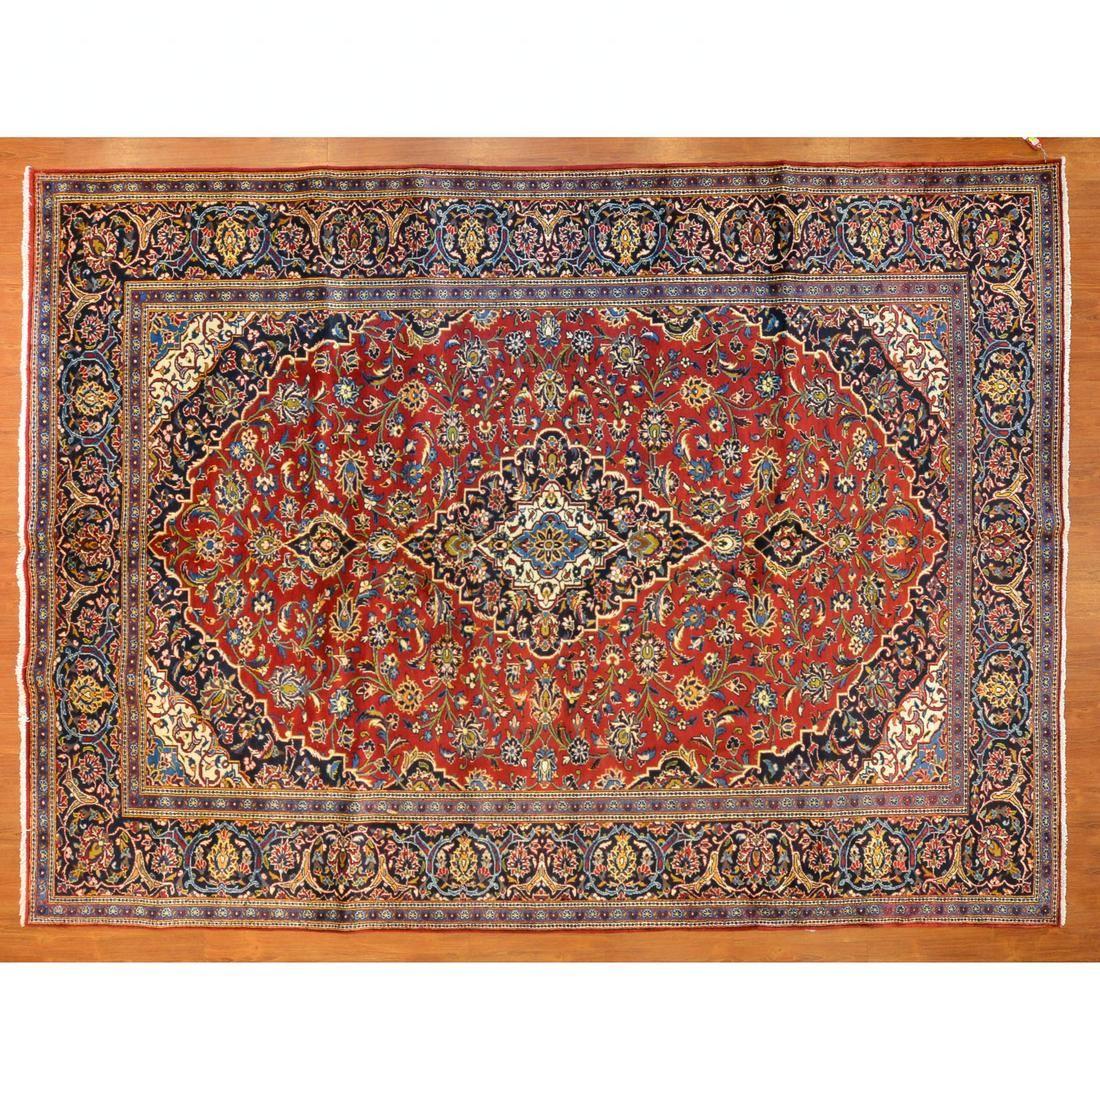 Kashan Rug, Persia, 8.9 x 12